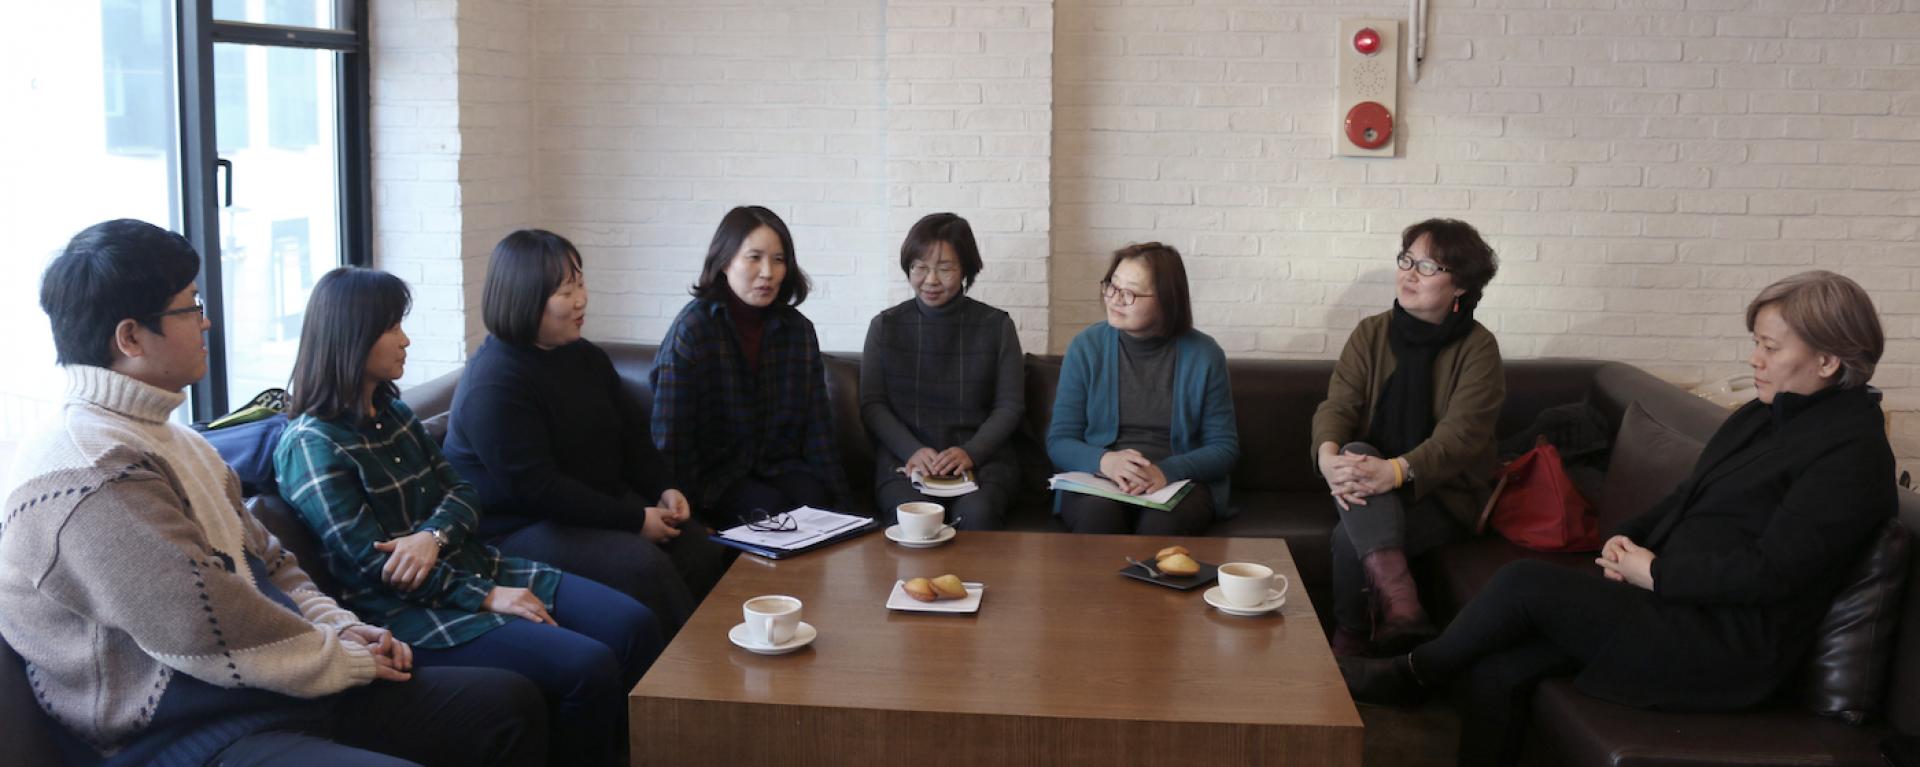 Editorial Meeting  Part 1